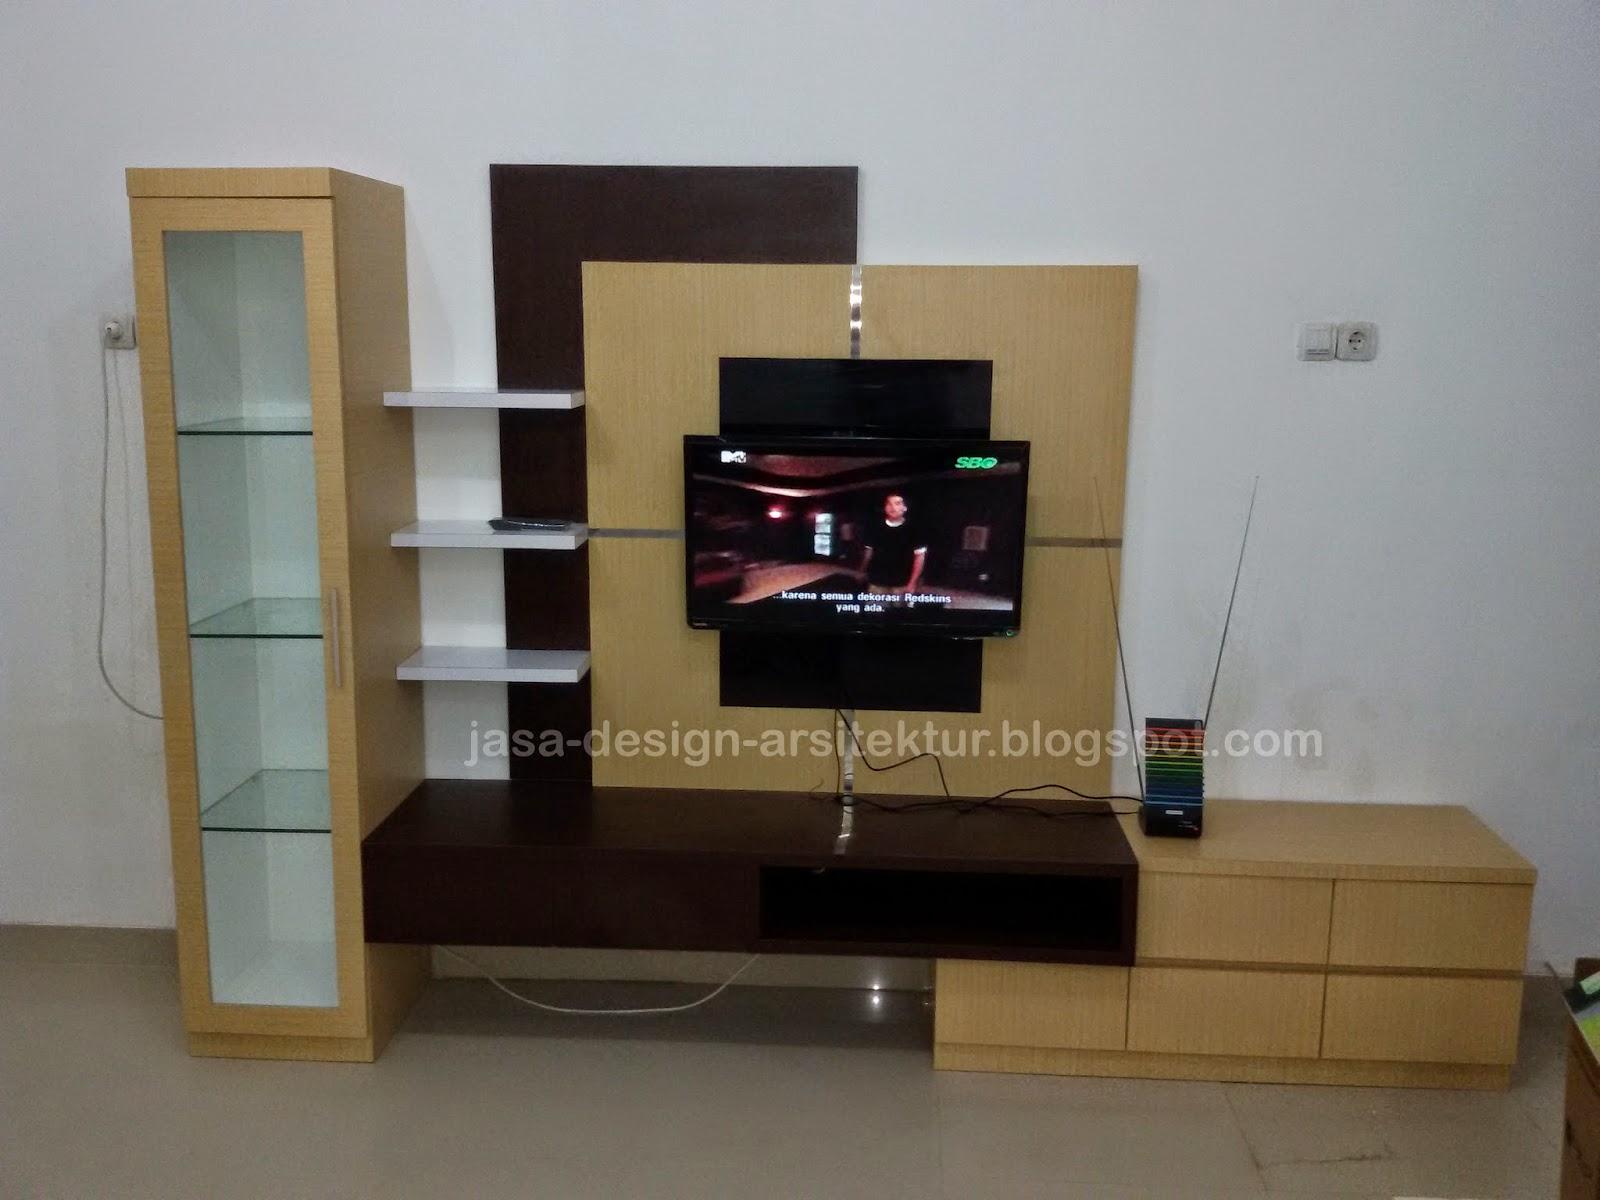 Kontraktor Interior Surabaya Sidoarjo Desain meja tv dan